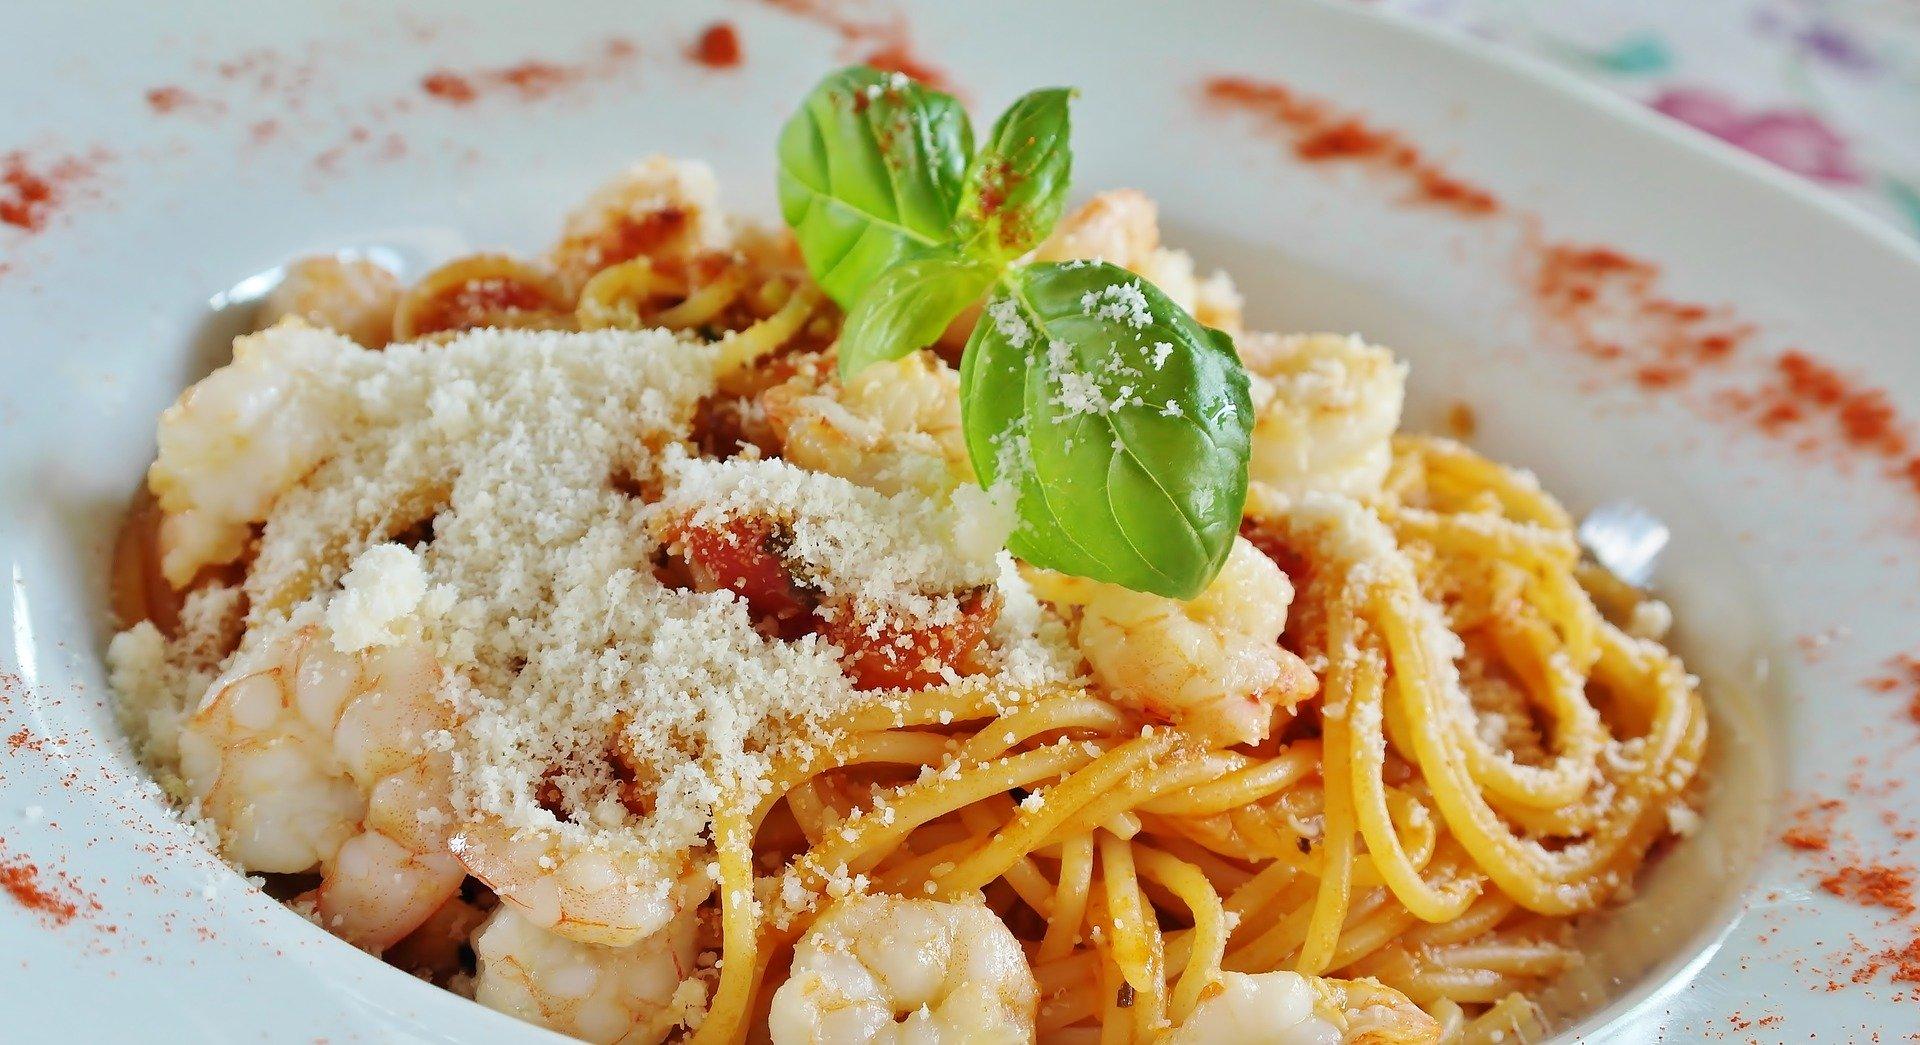 Food stroll & tasting in Milan city centre